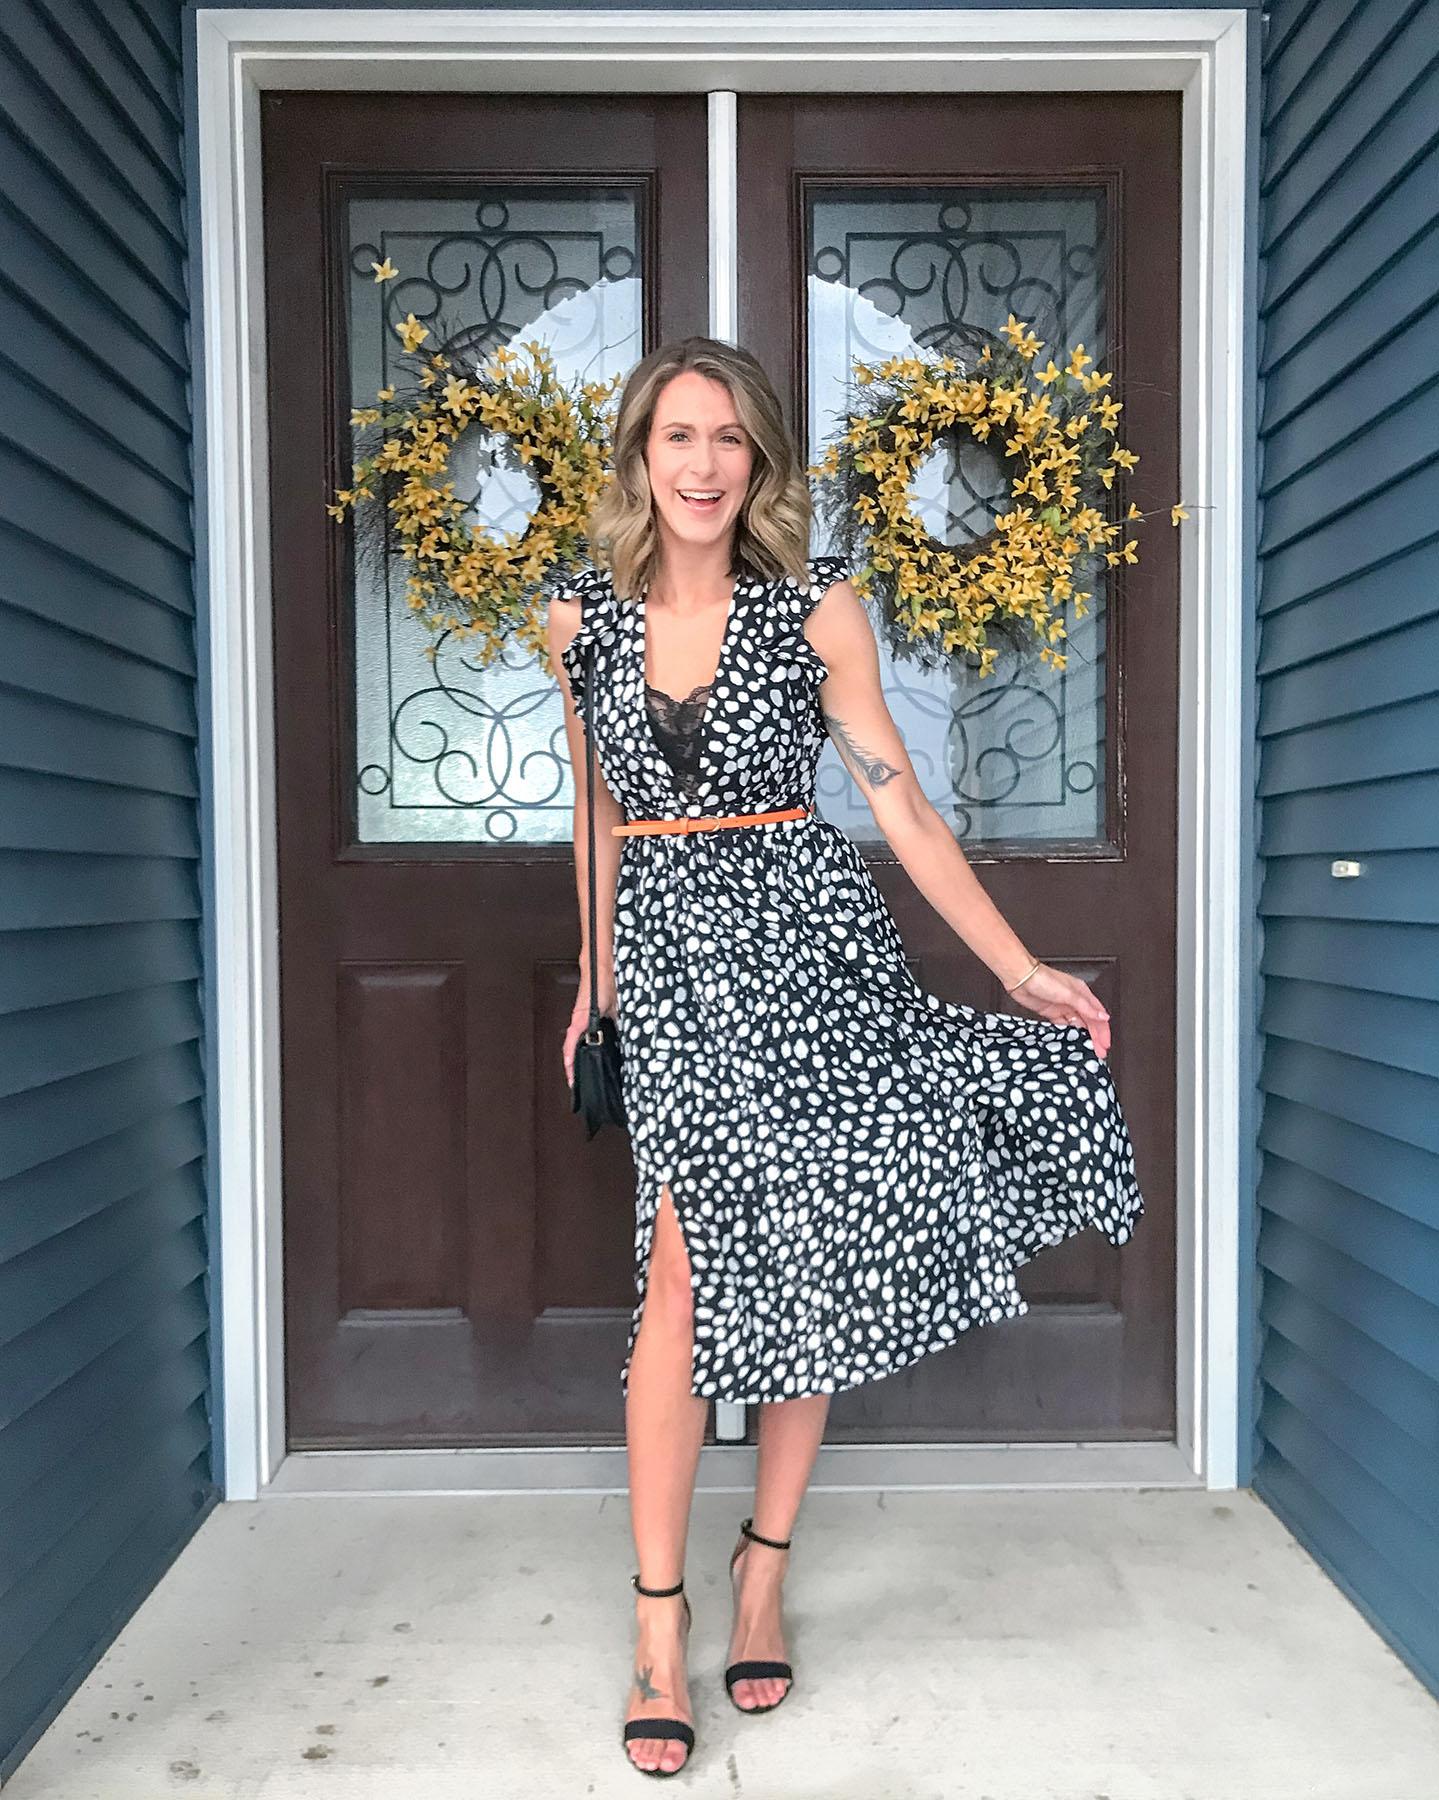 Polka Dot Dress + My Favorites